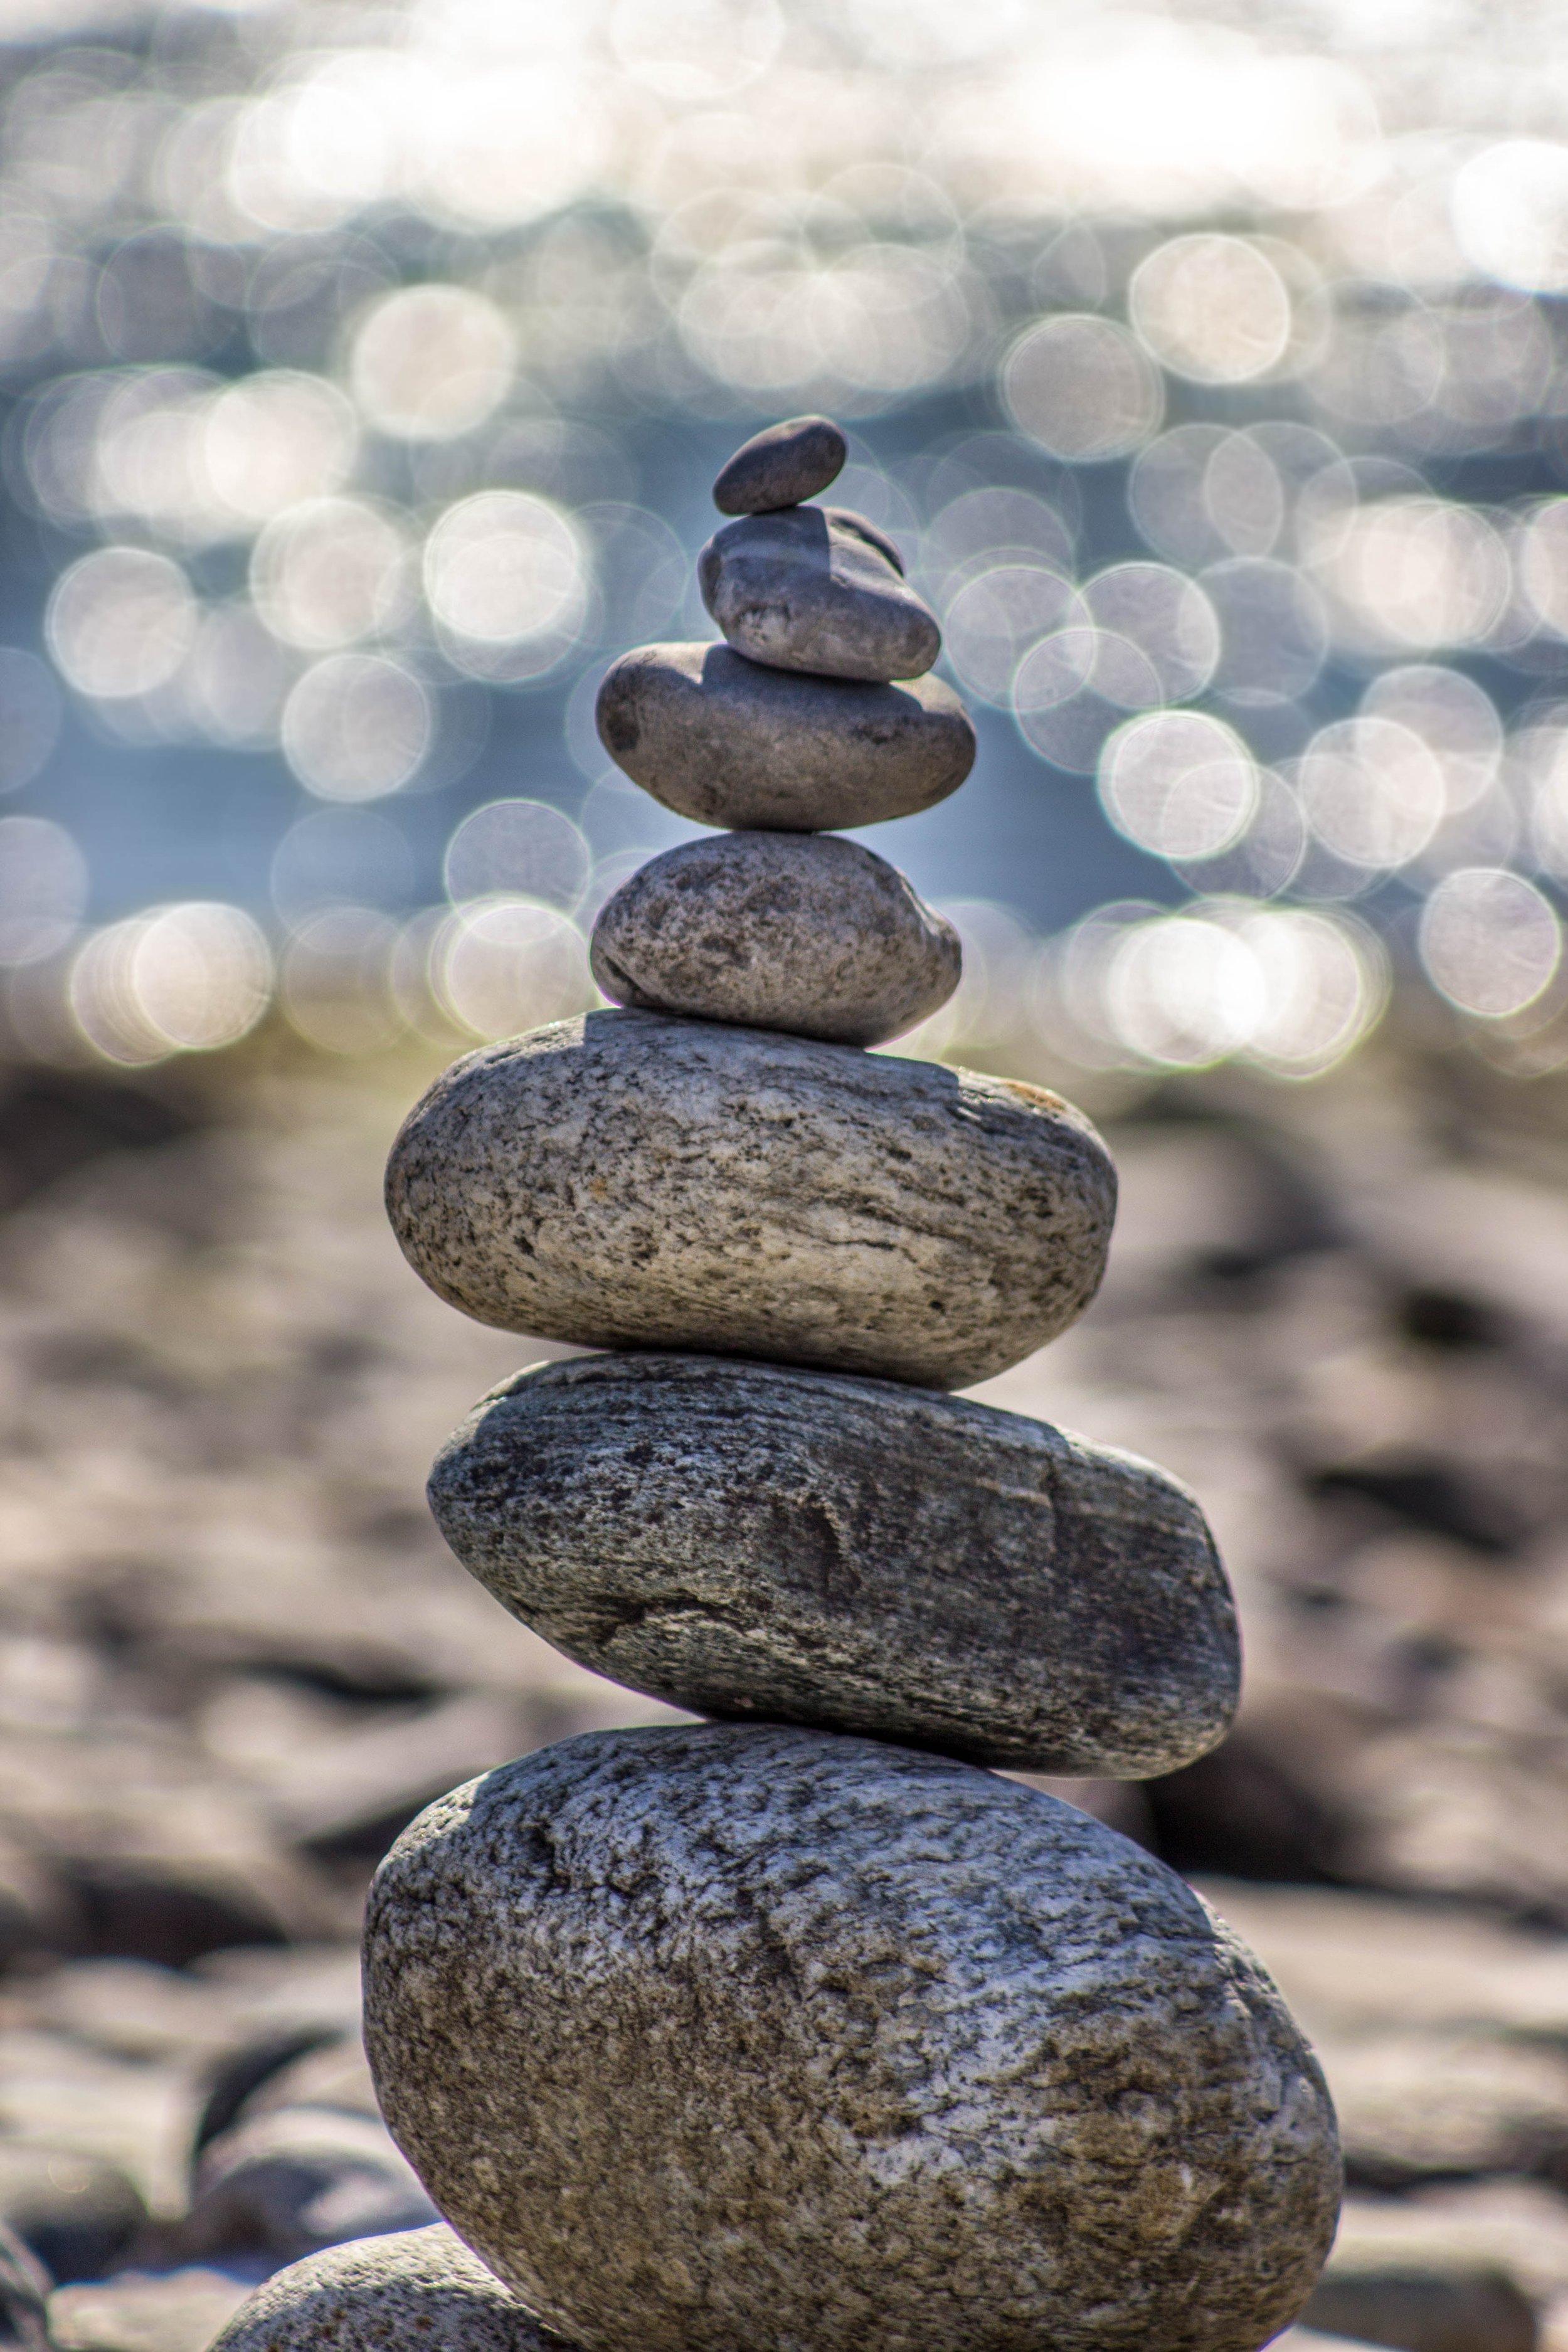 A Picture Depicting Balancing Rocks - deniz-altindas-38128.jpg